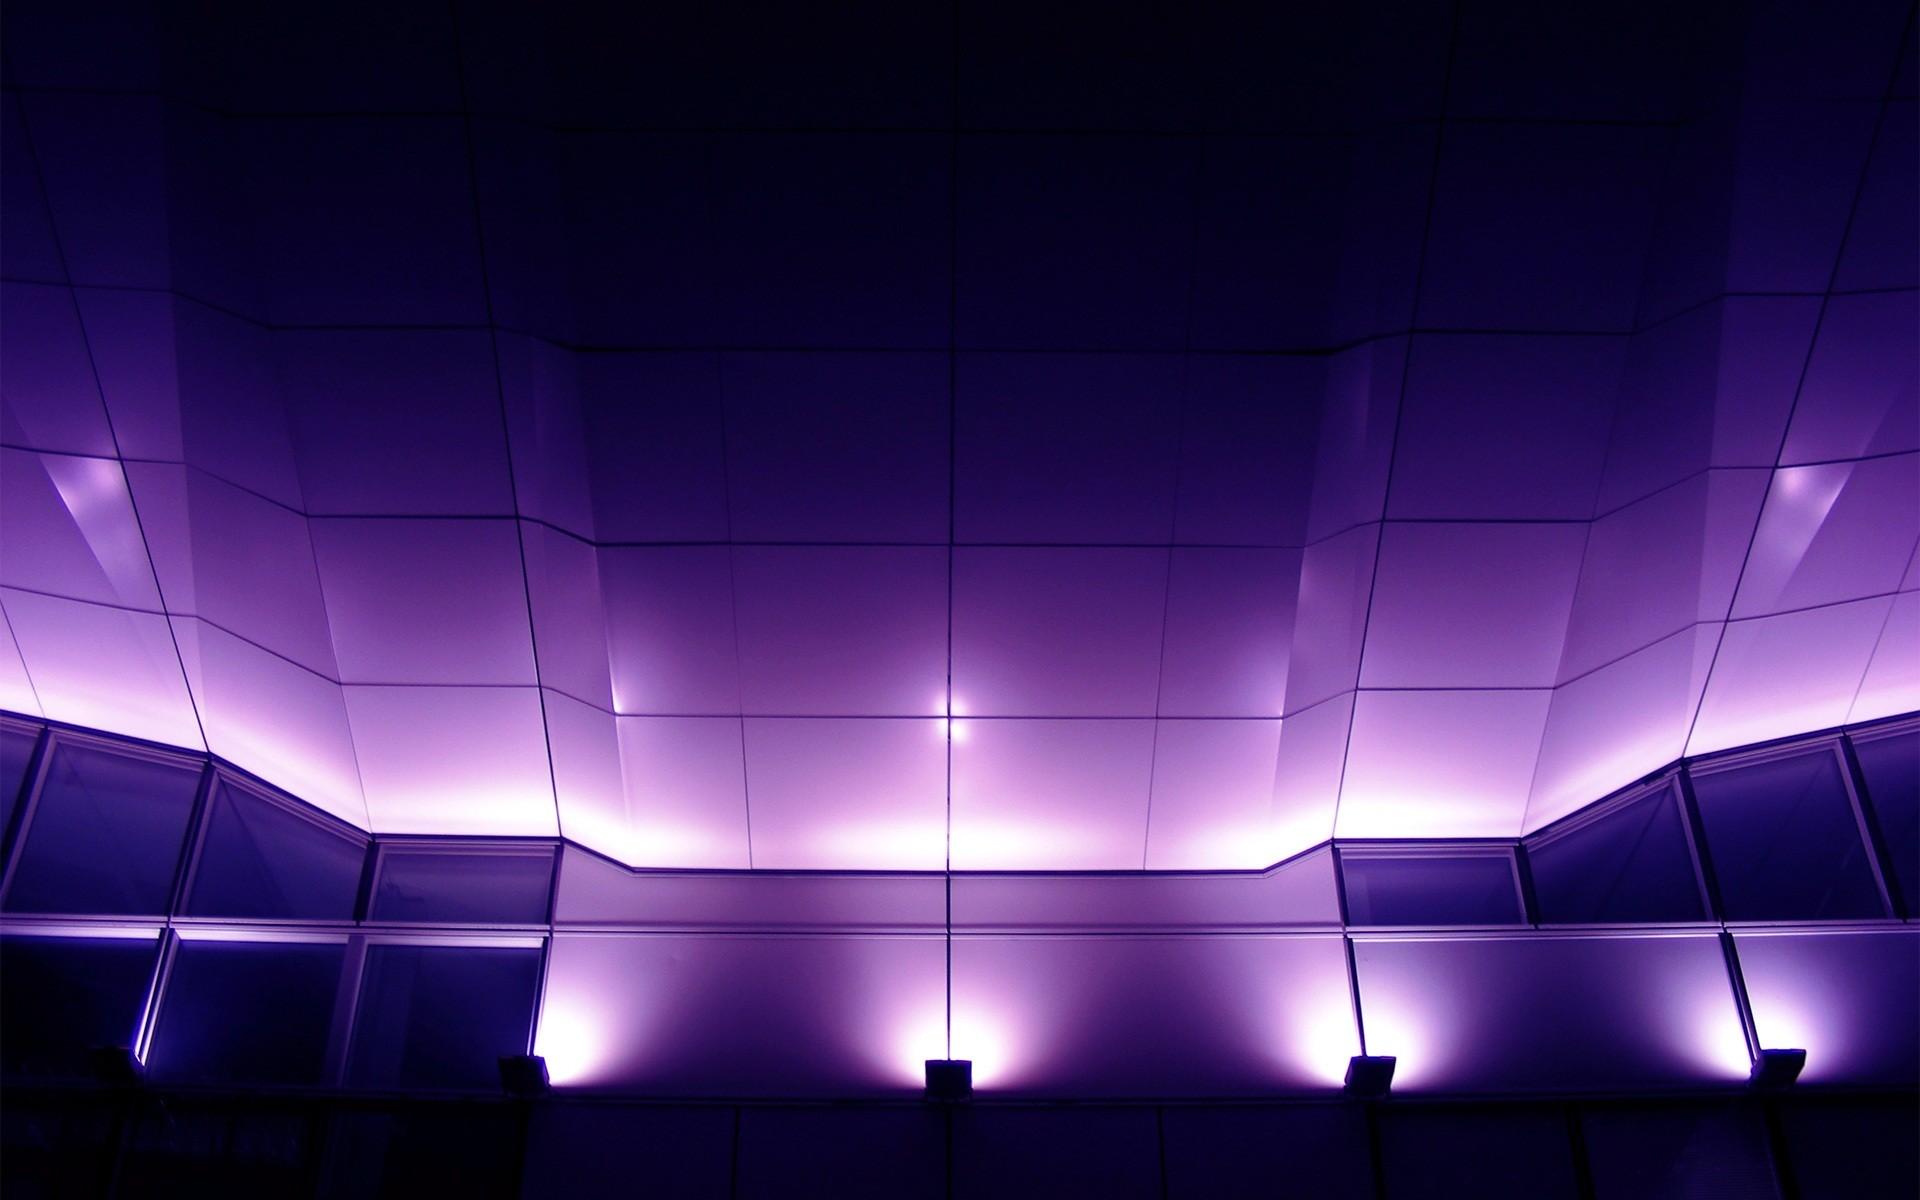 Purple Wallpaper For Iphone 5275 Free Desktop Wallpapers HD – Res .